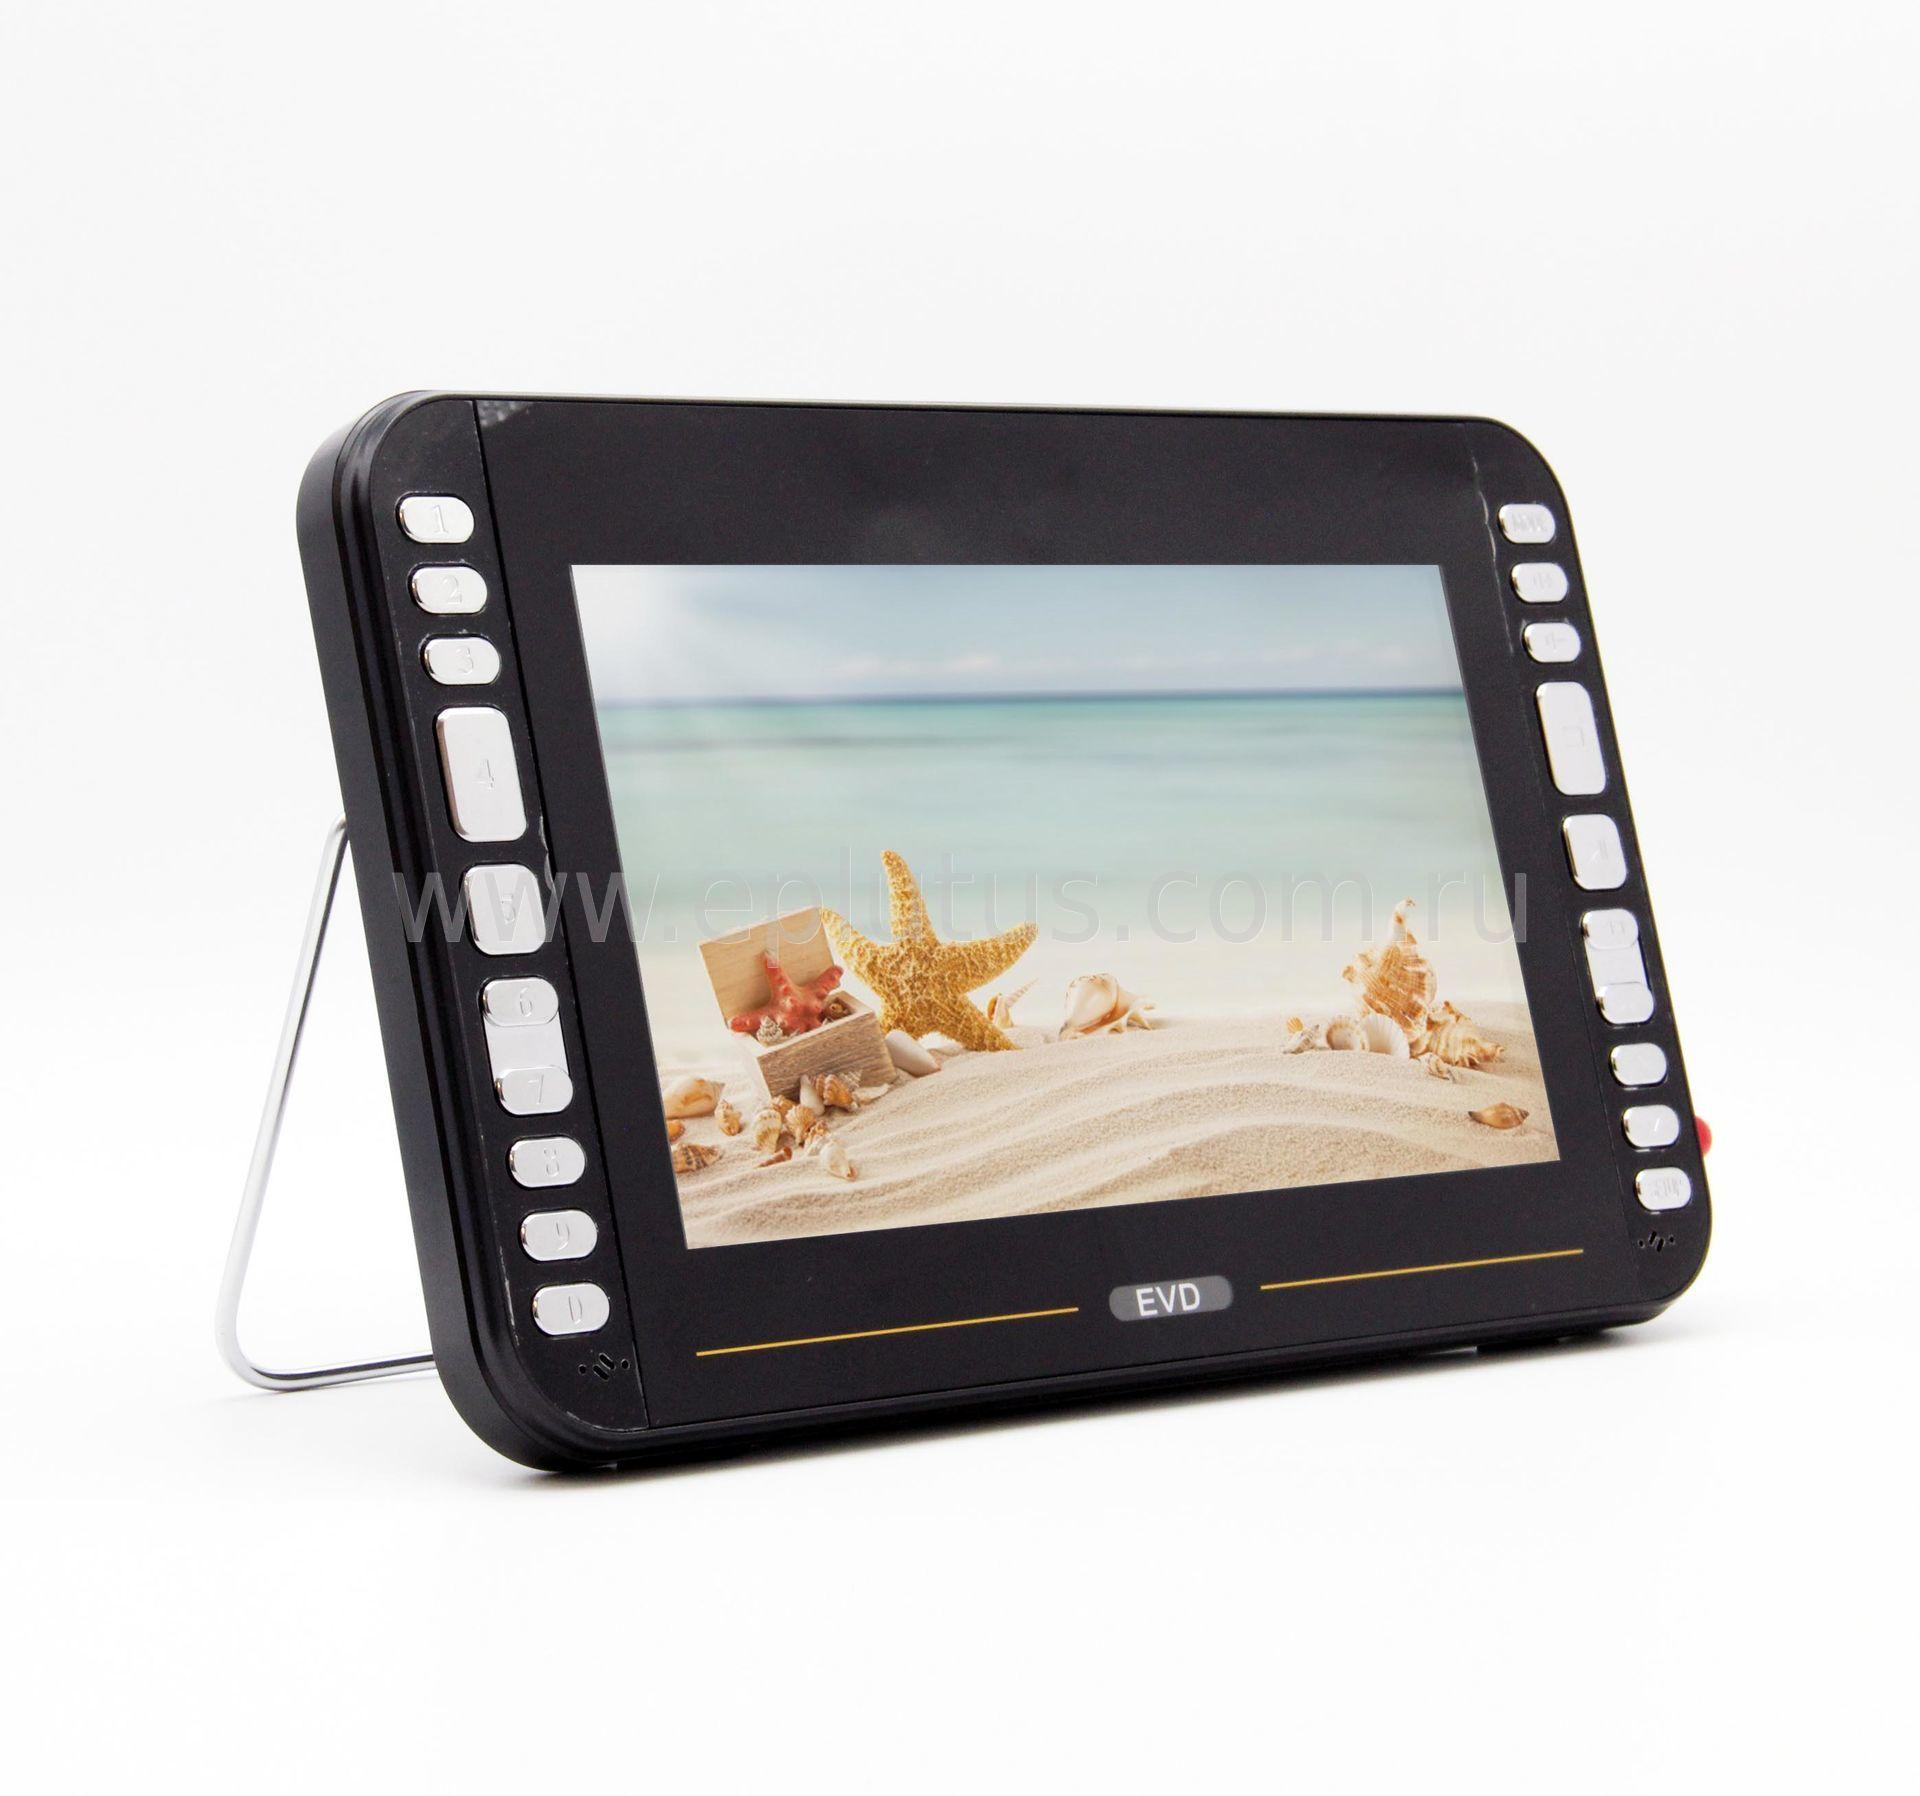 DVD-плеер Eplutus LS-105Т портативный флэш плеер rolsen rbm412br коричневый